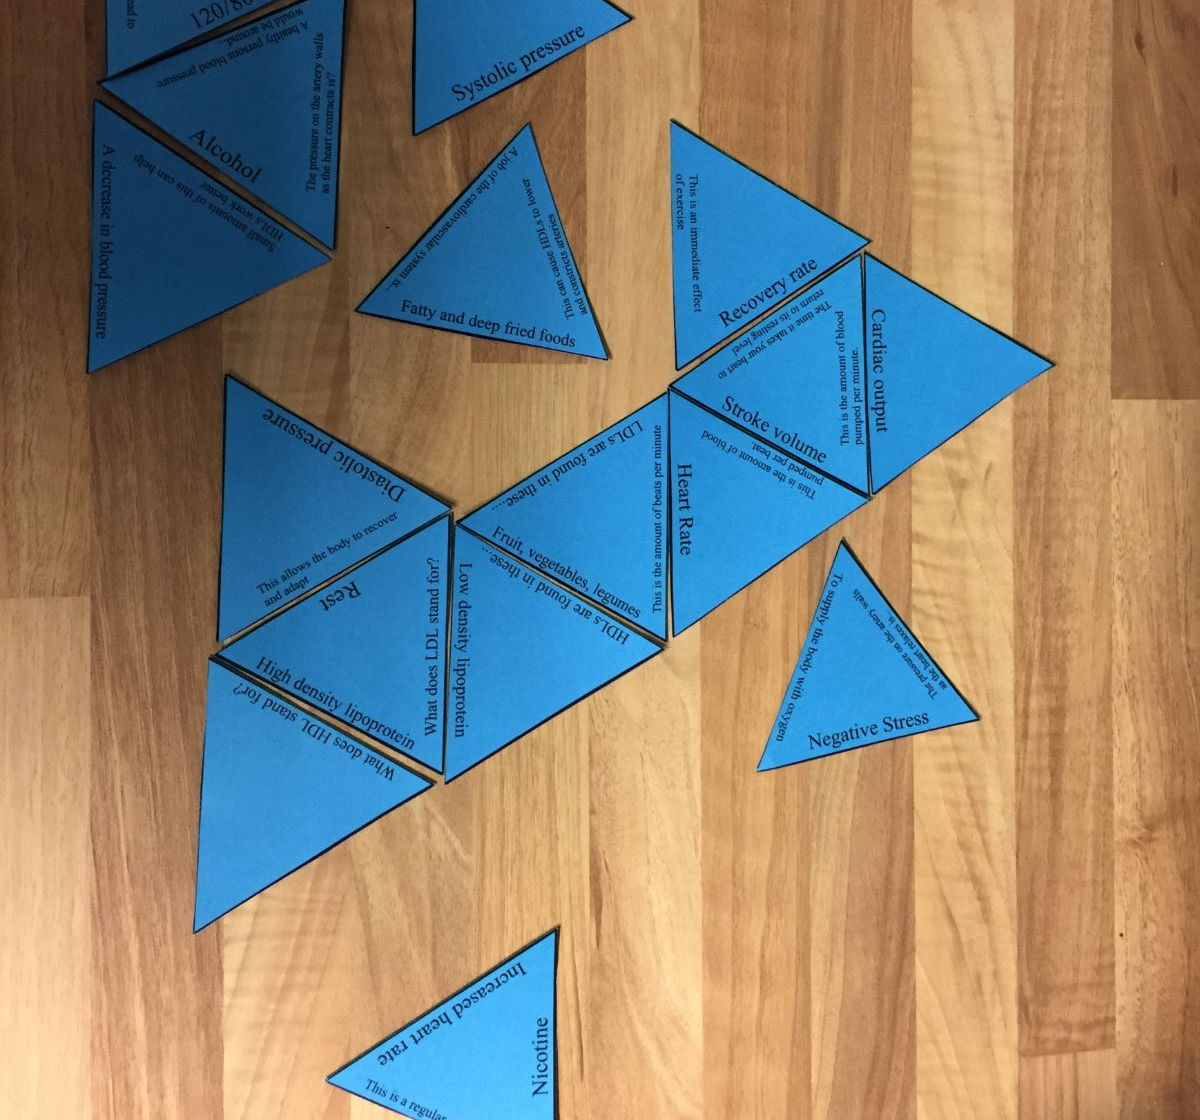 GCSE PE Edexcel 9-1 PAPER 2 Tarsia Triangle Puzzle set